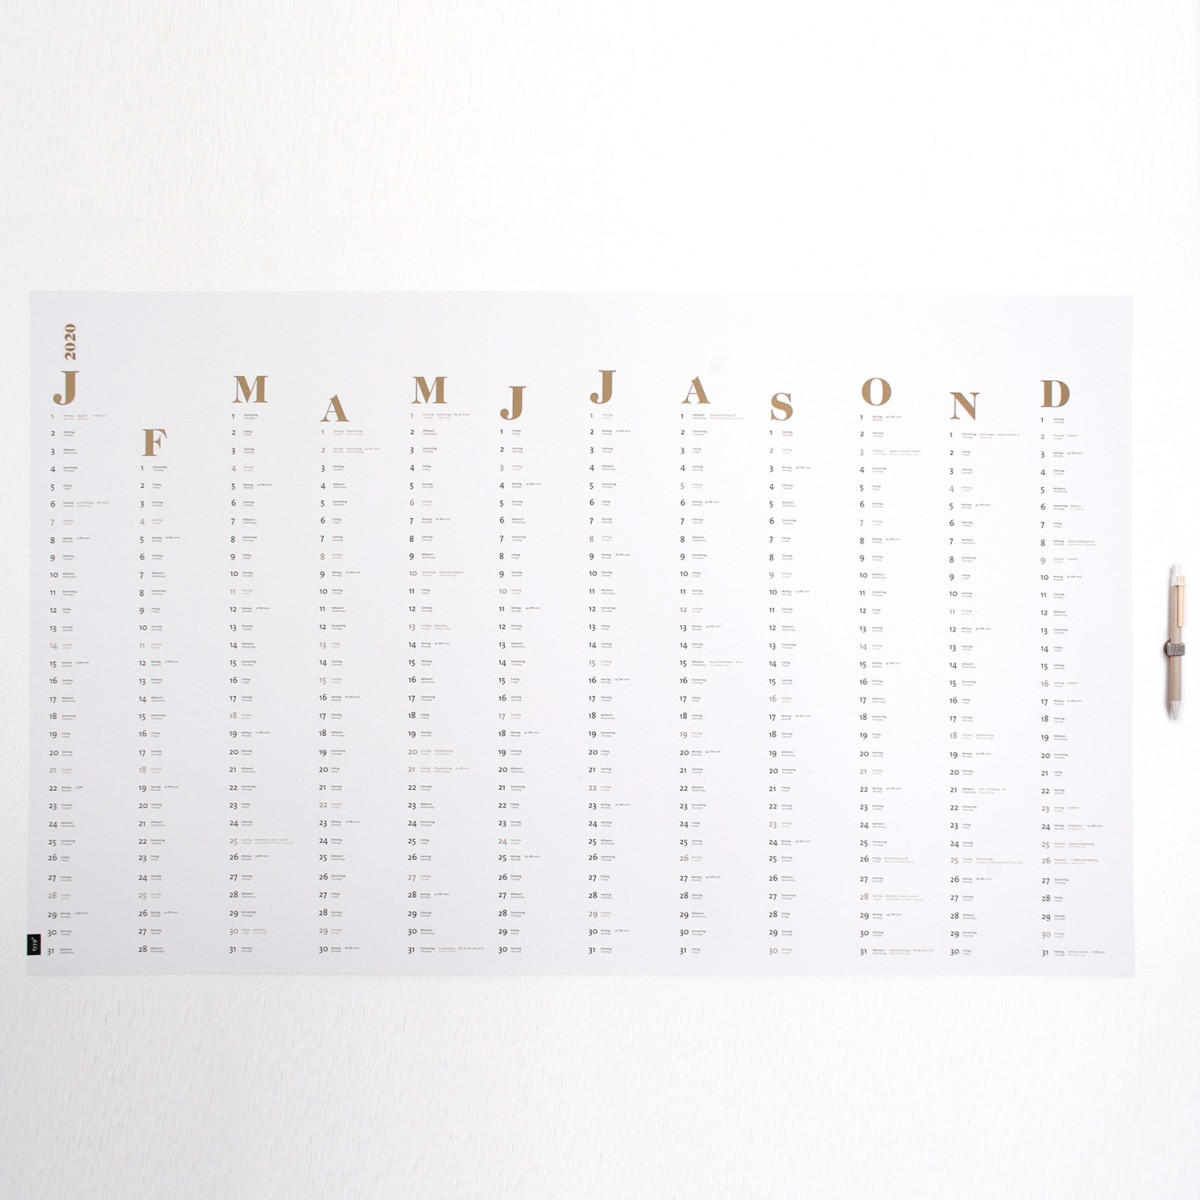 tyyp Wandkalender 2020